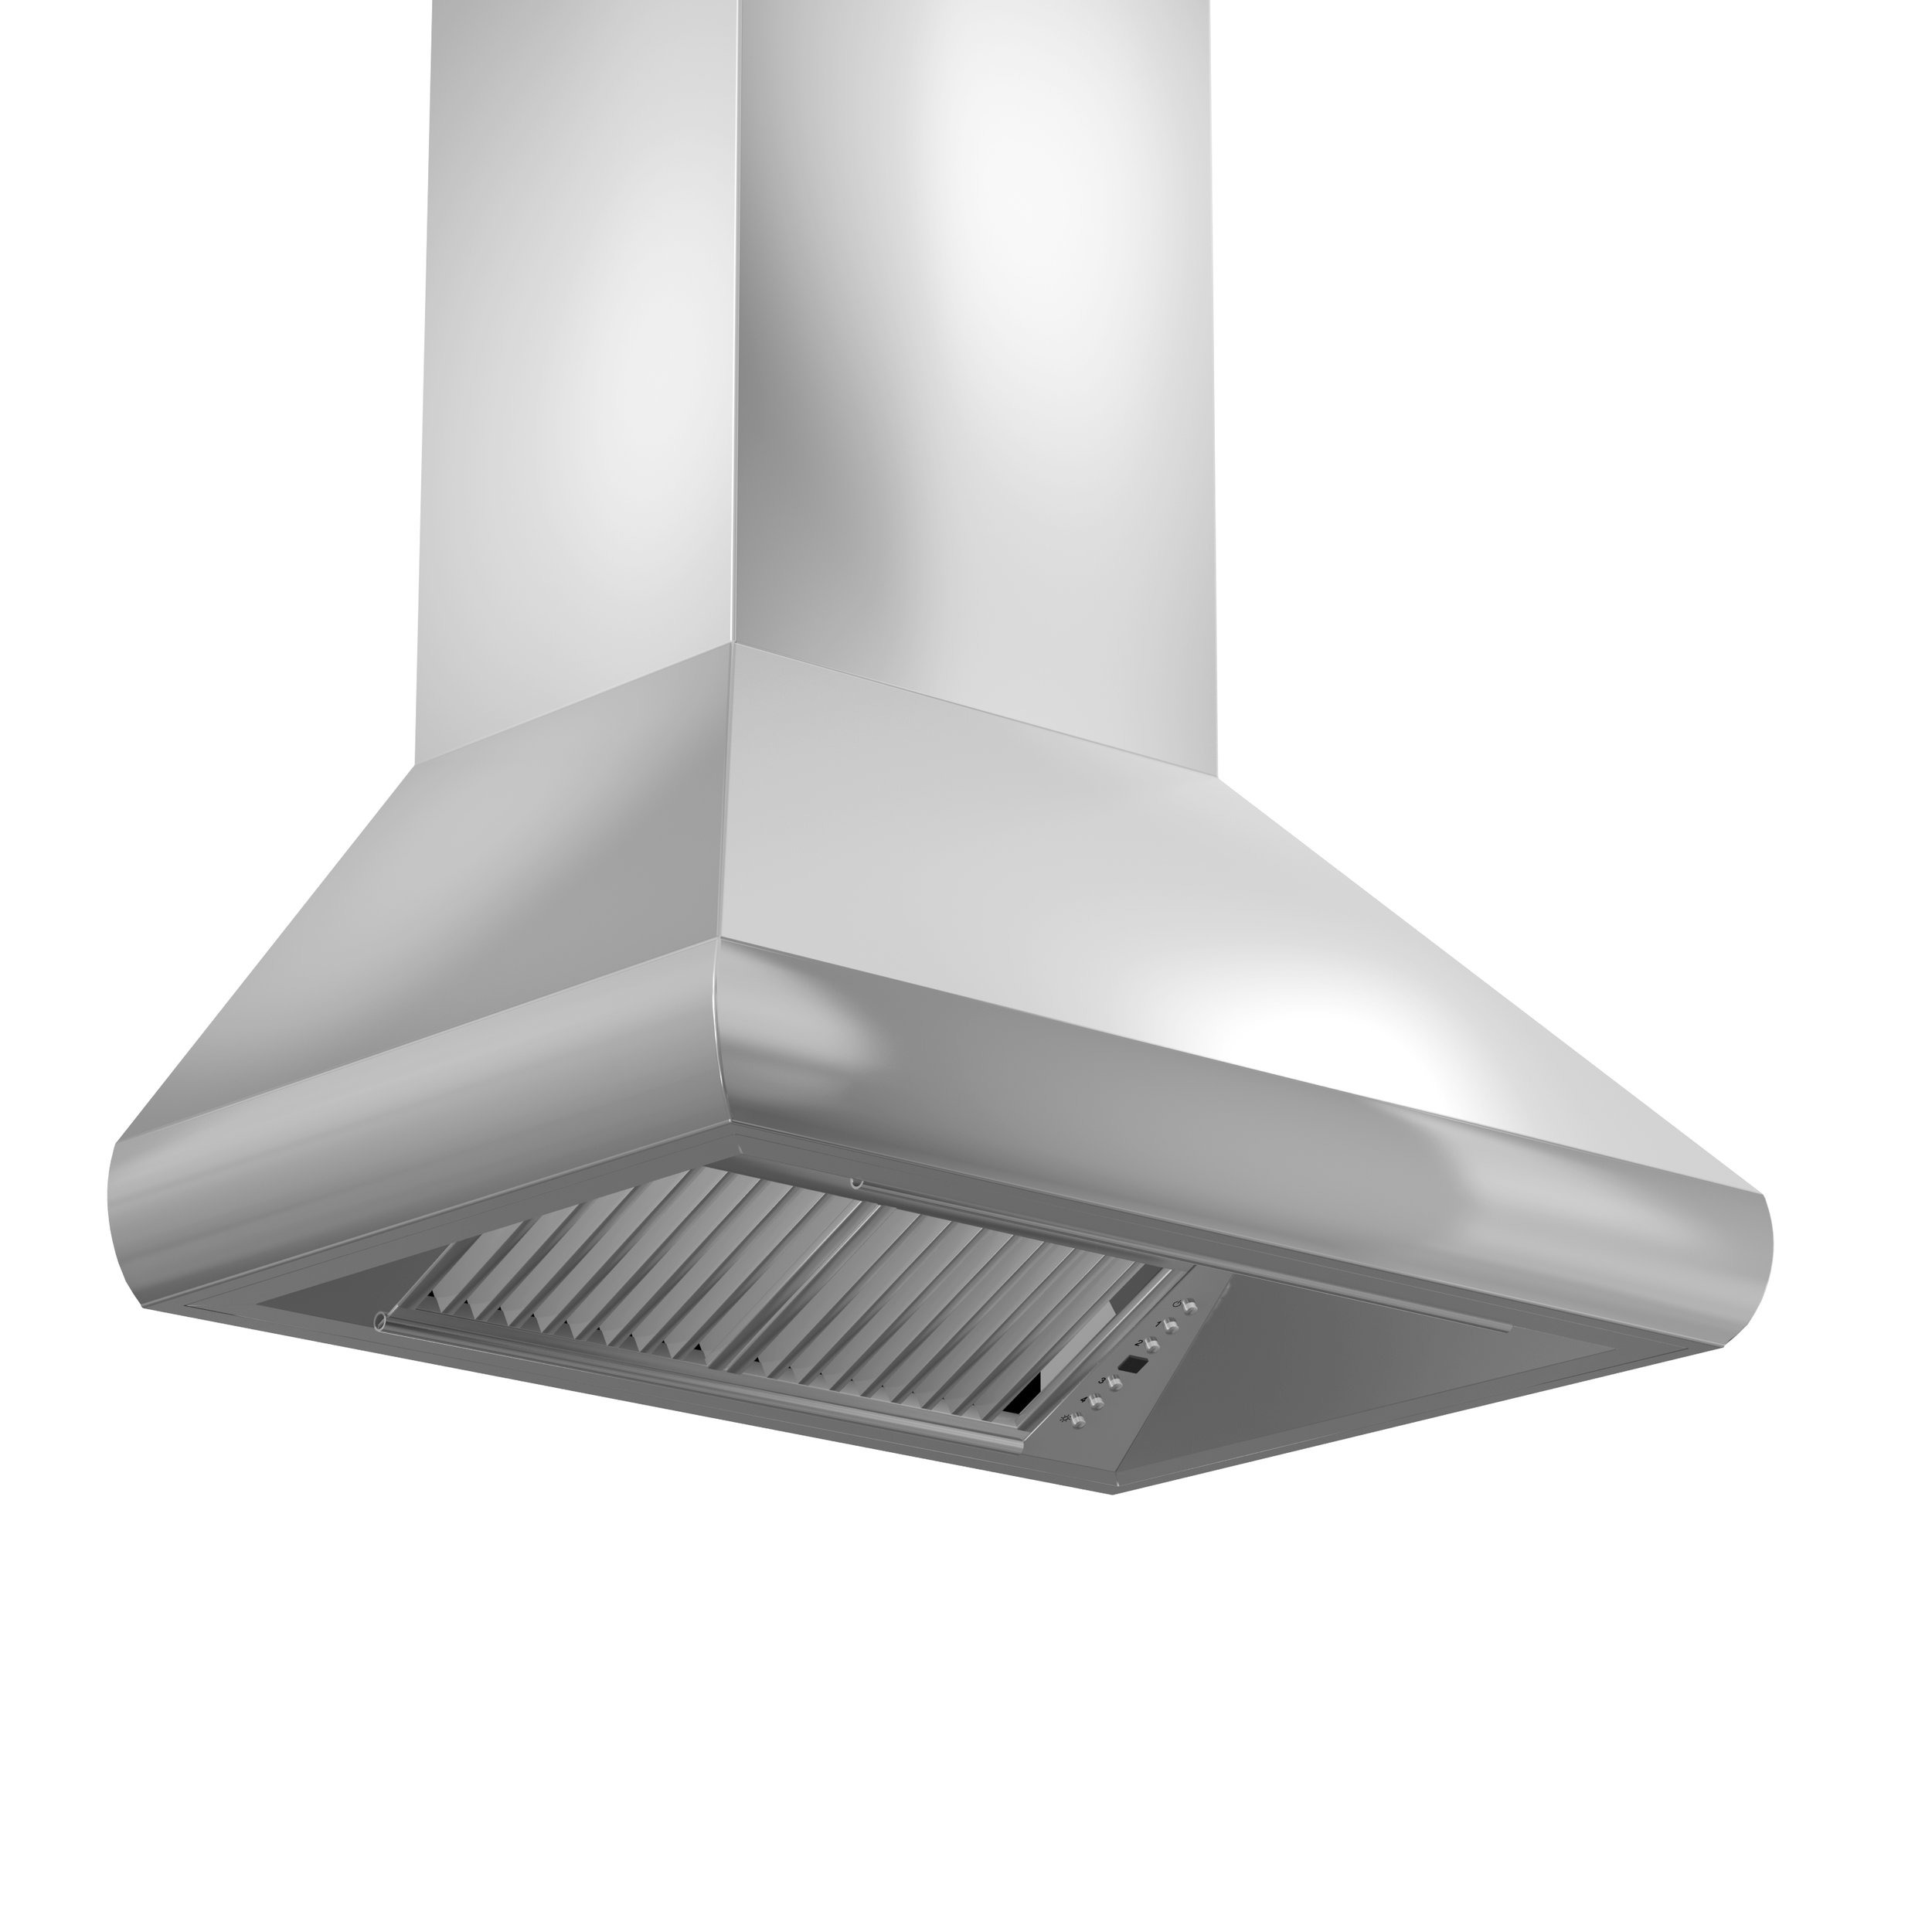 zline-stainless-steel-wall-mounted-range-hood-687-side-under.jpg